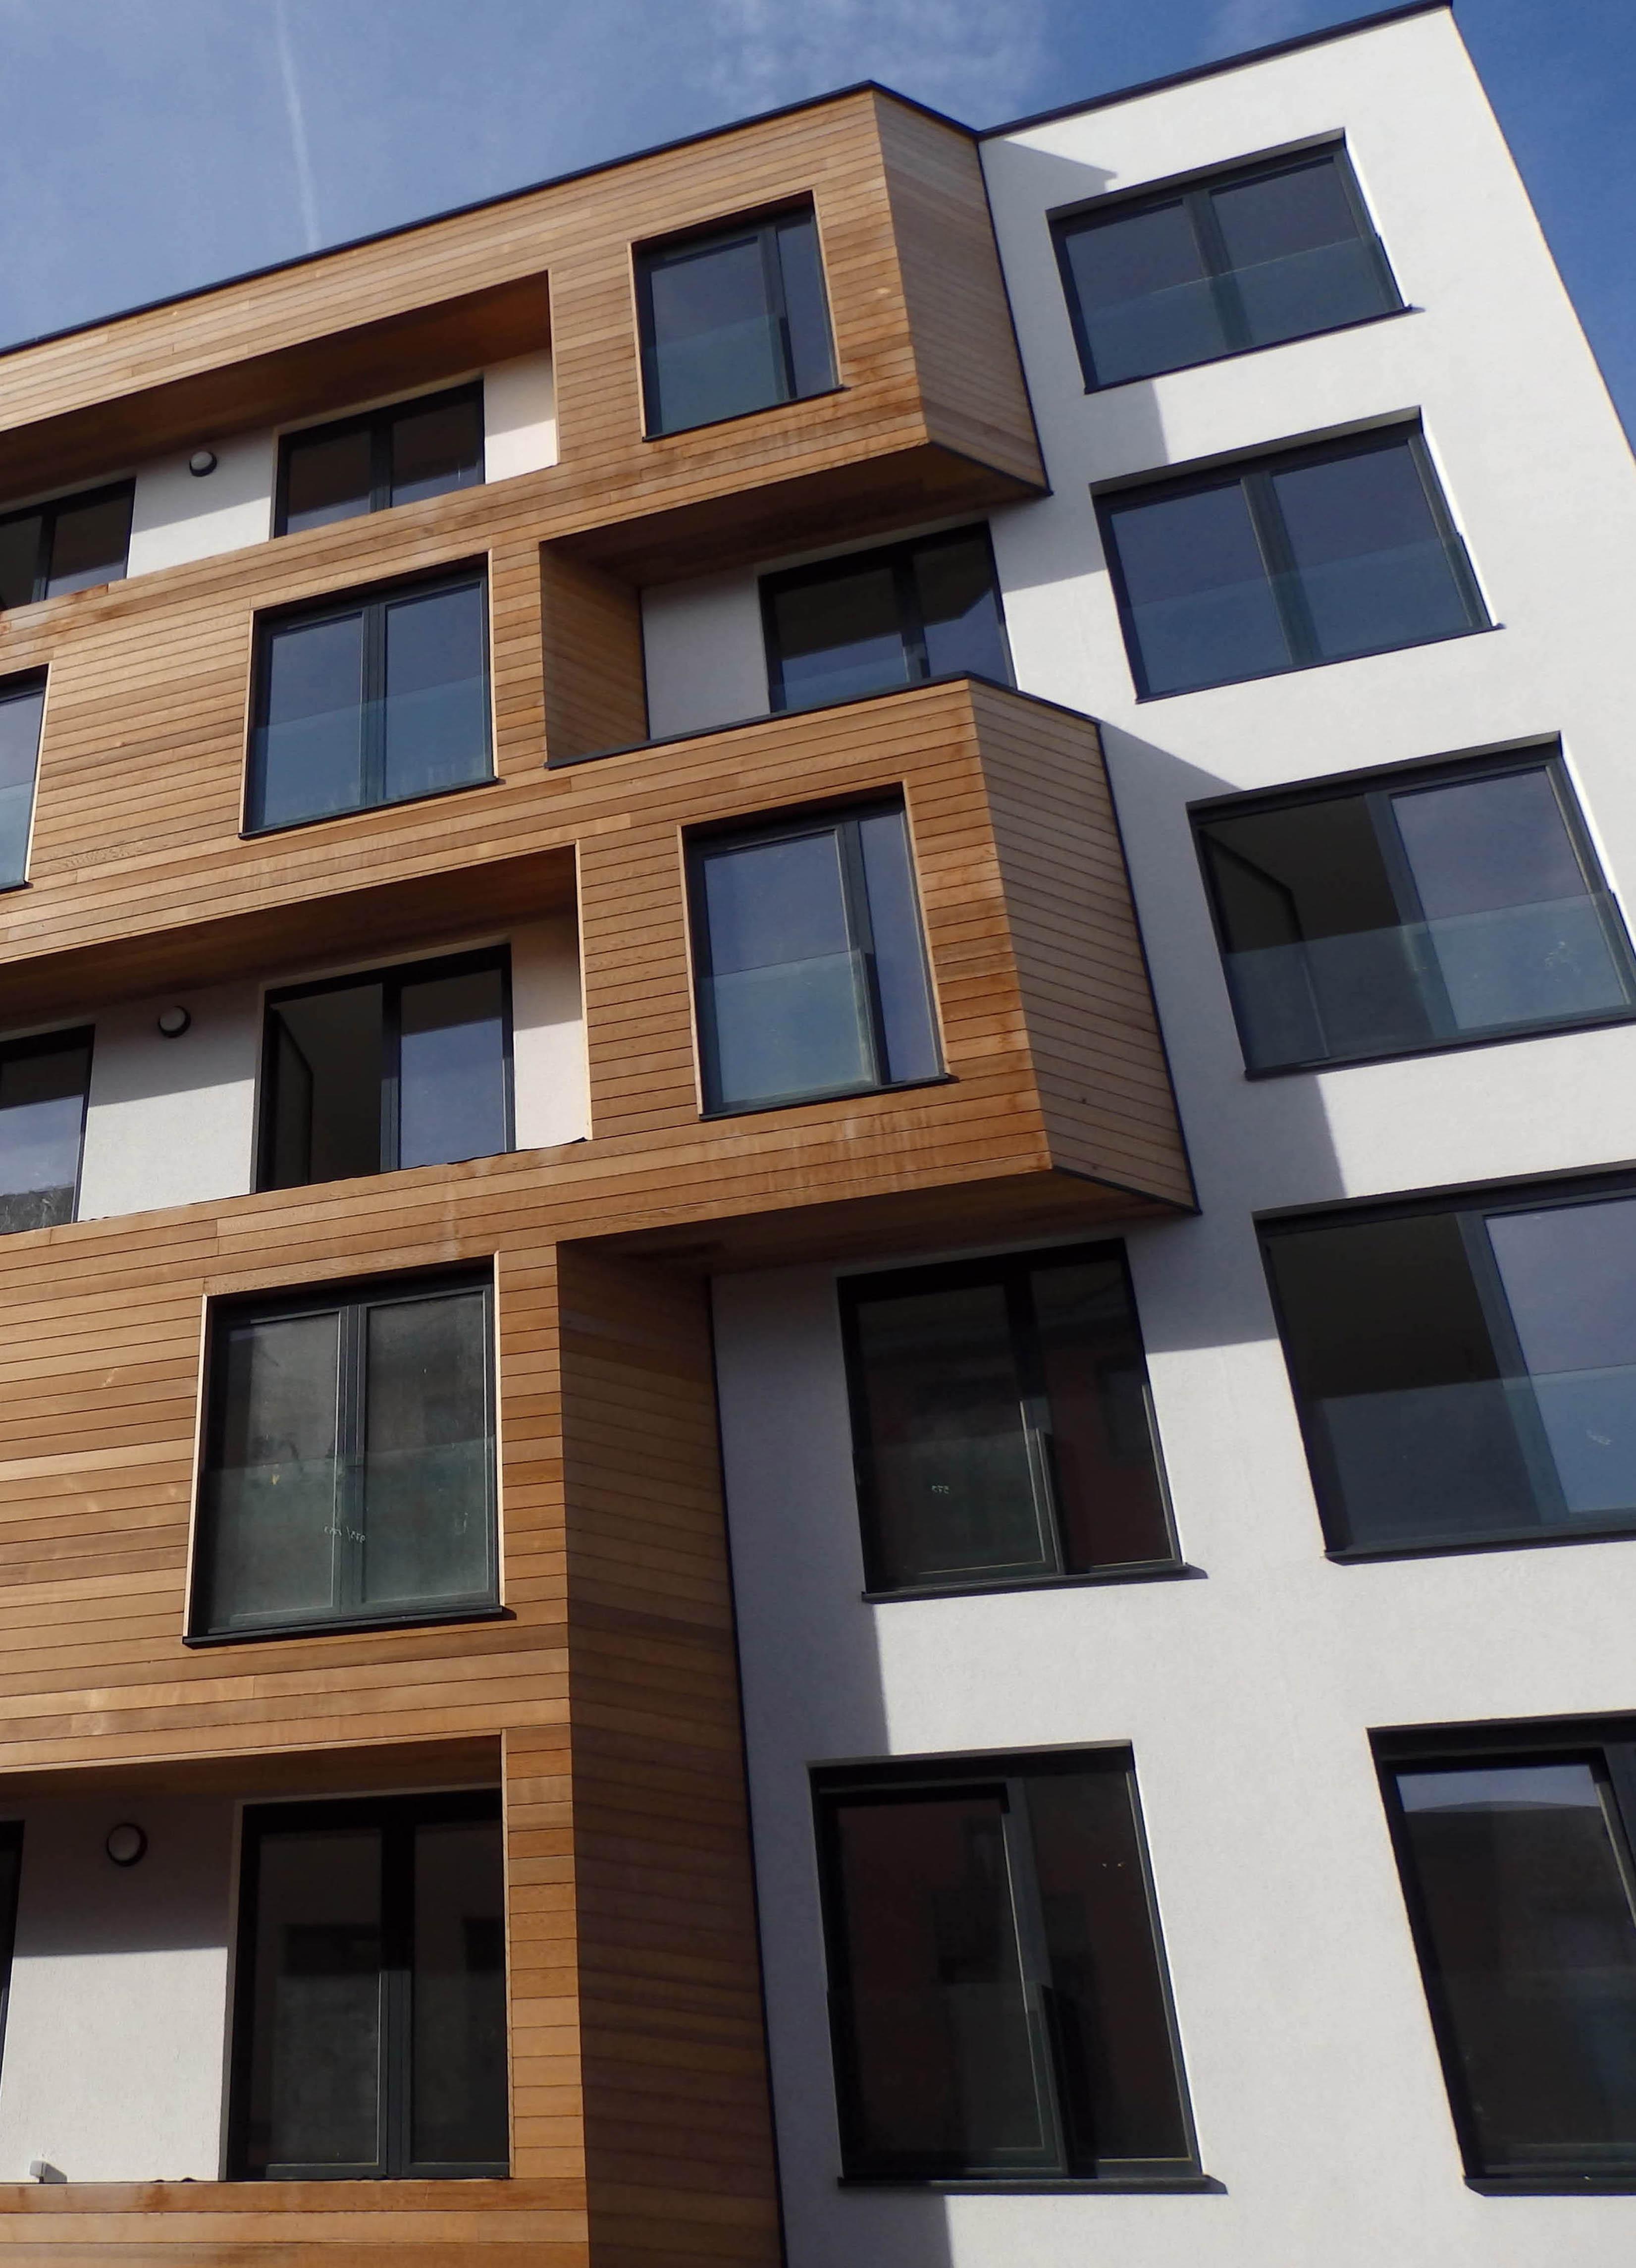 Lowette & partners architects cvba - Aldi Sint-Jans-Molenbeek